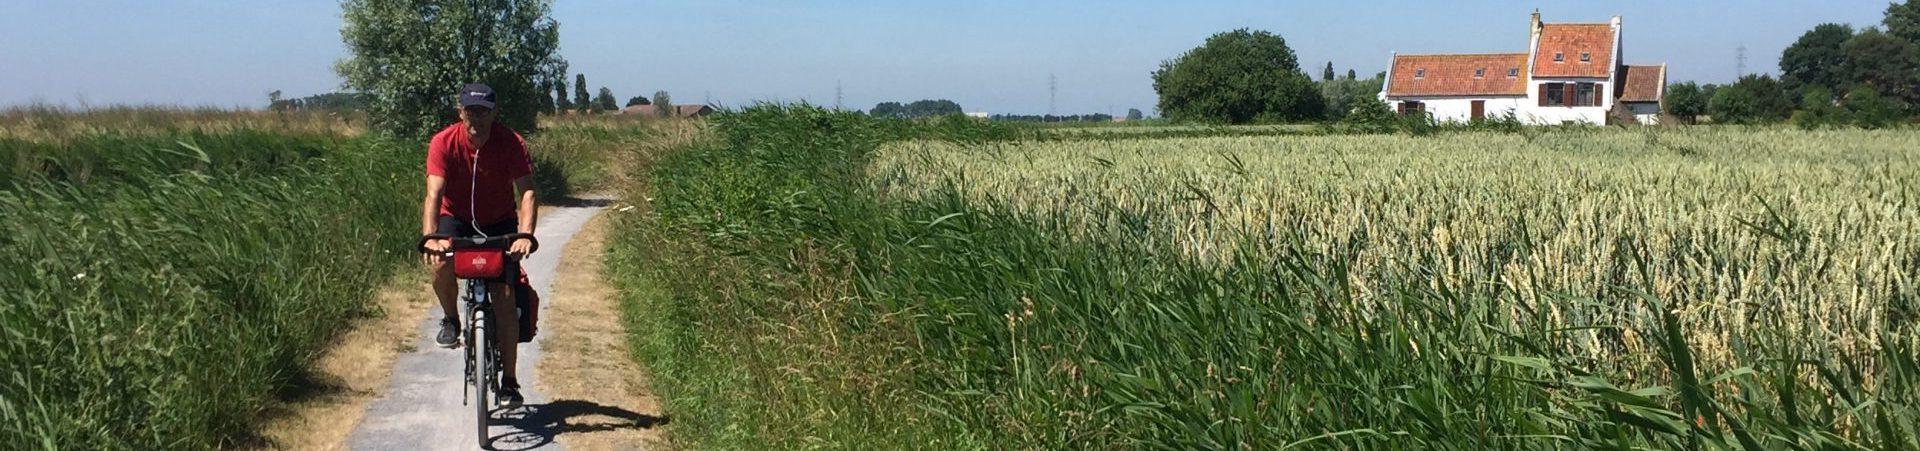 Veurne-Ambacht fietsroute - Genieten op 2 wielen - Fietsroute reviews van  Herman De Wulf